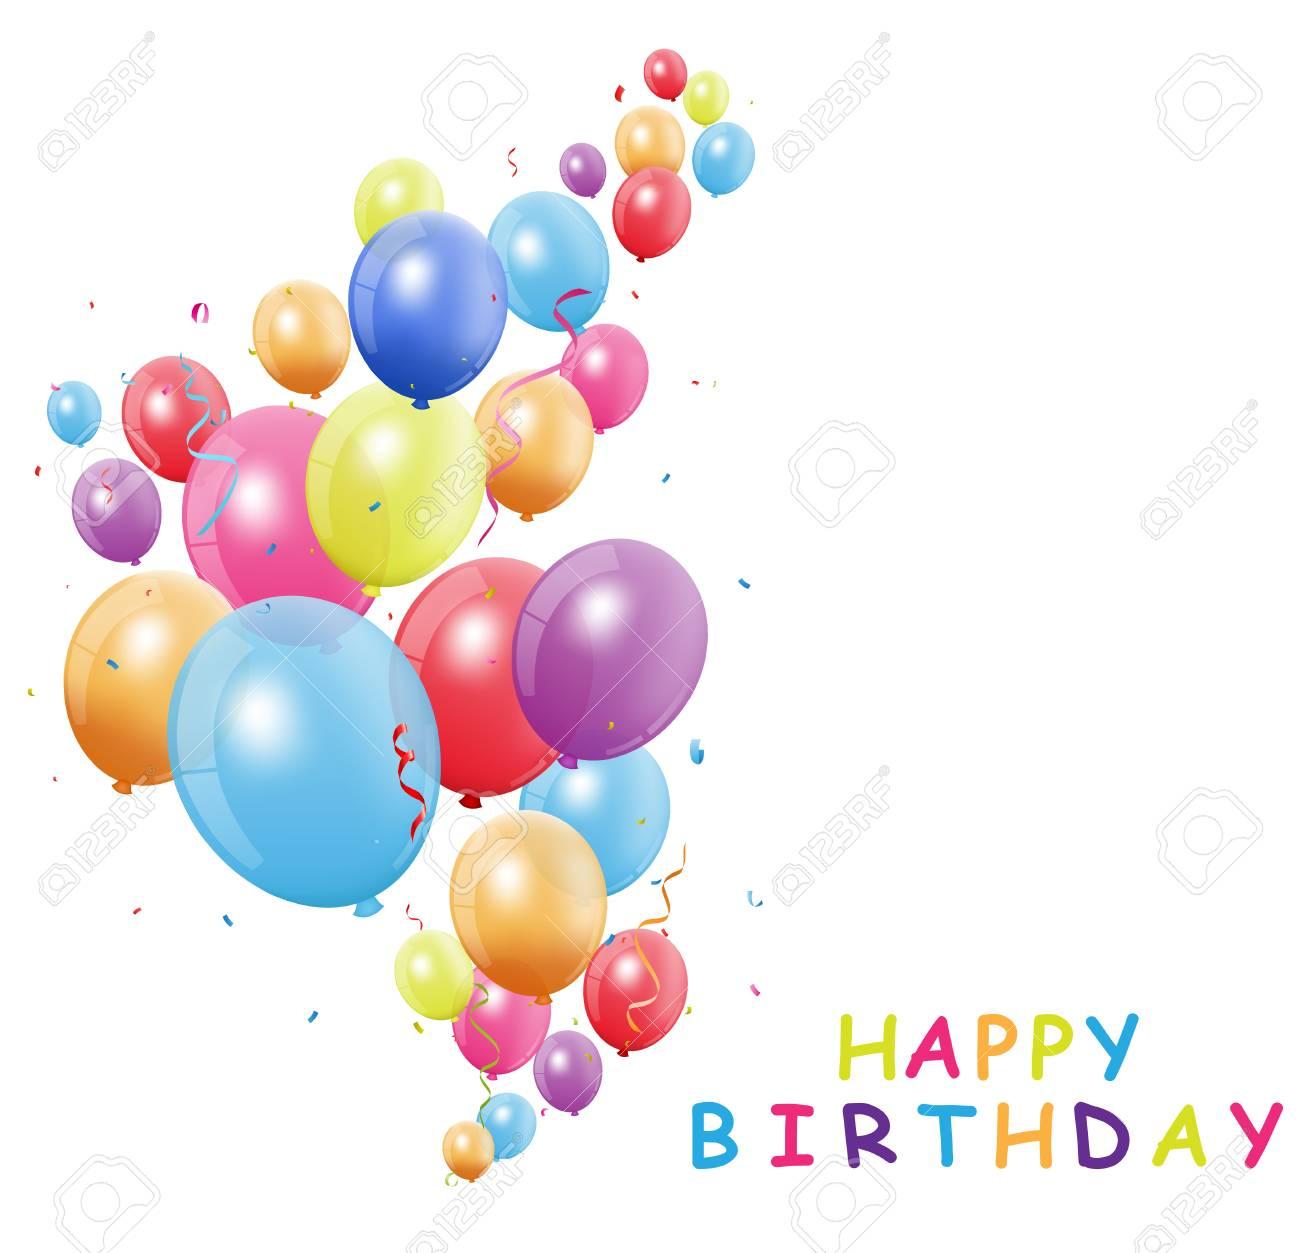 Carte anniversaire avec ballons